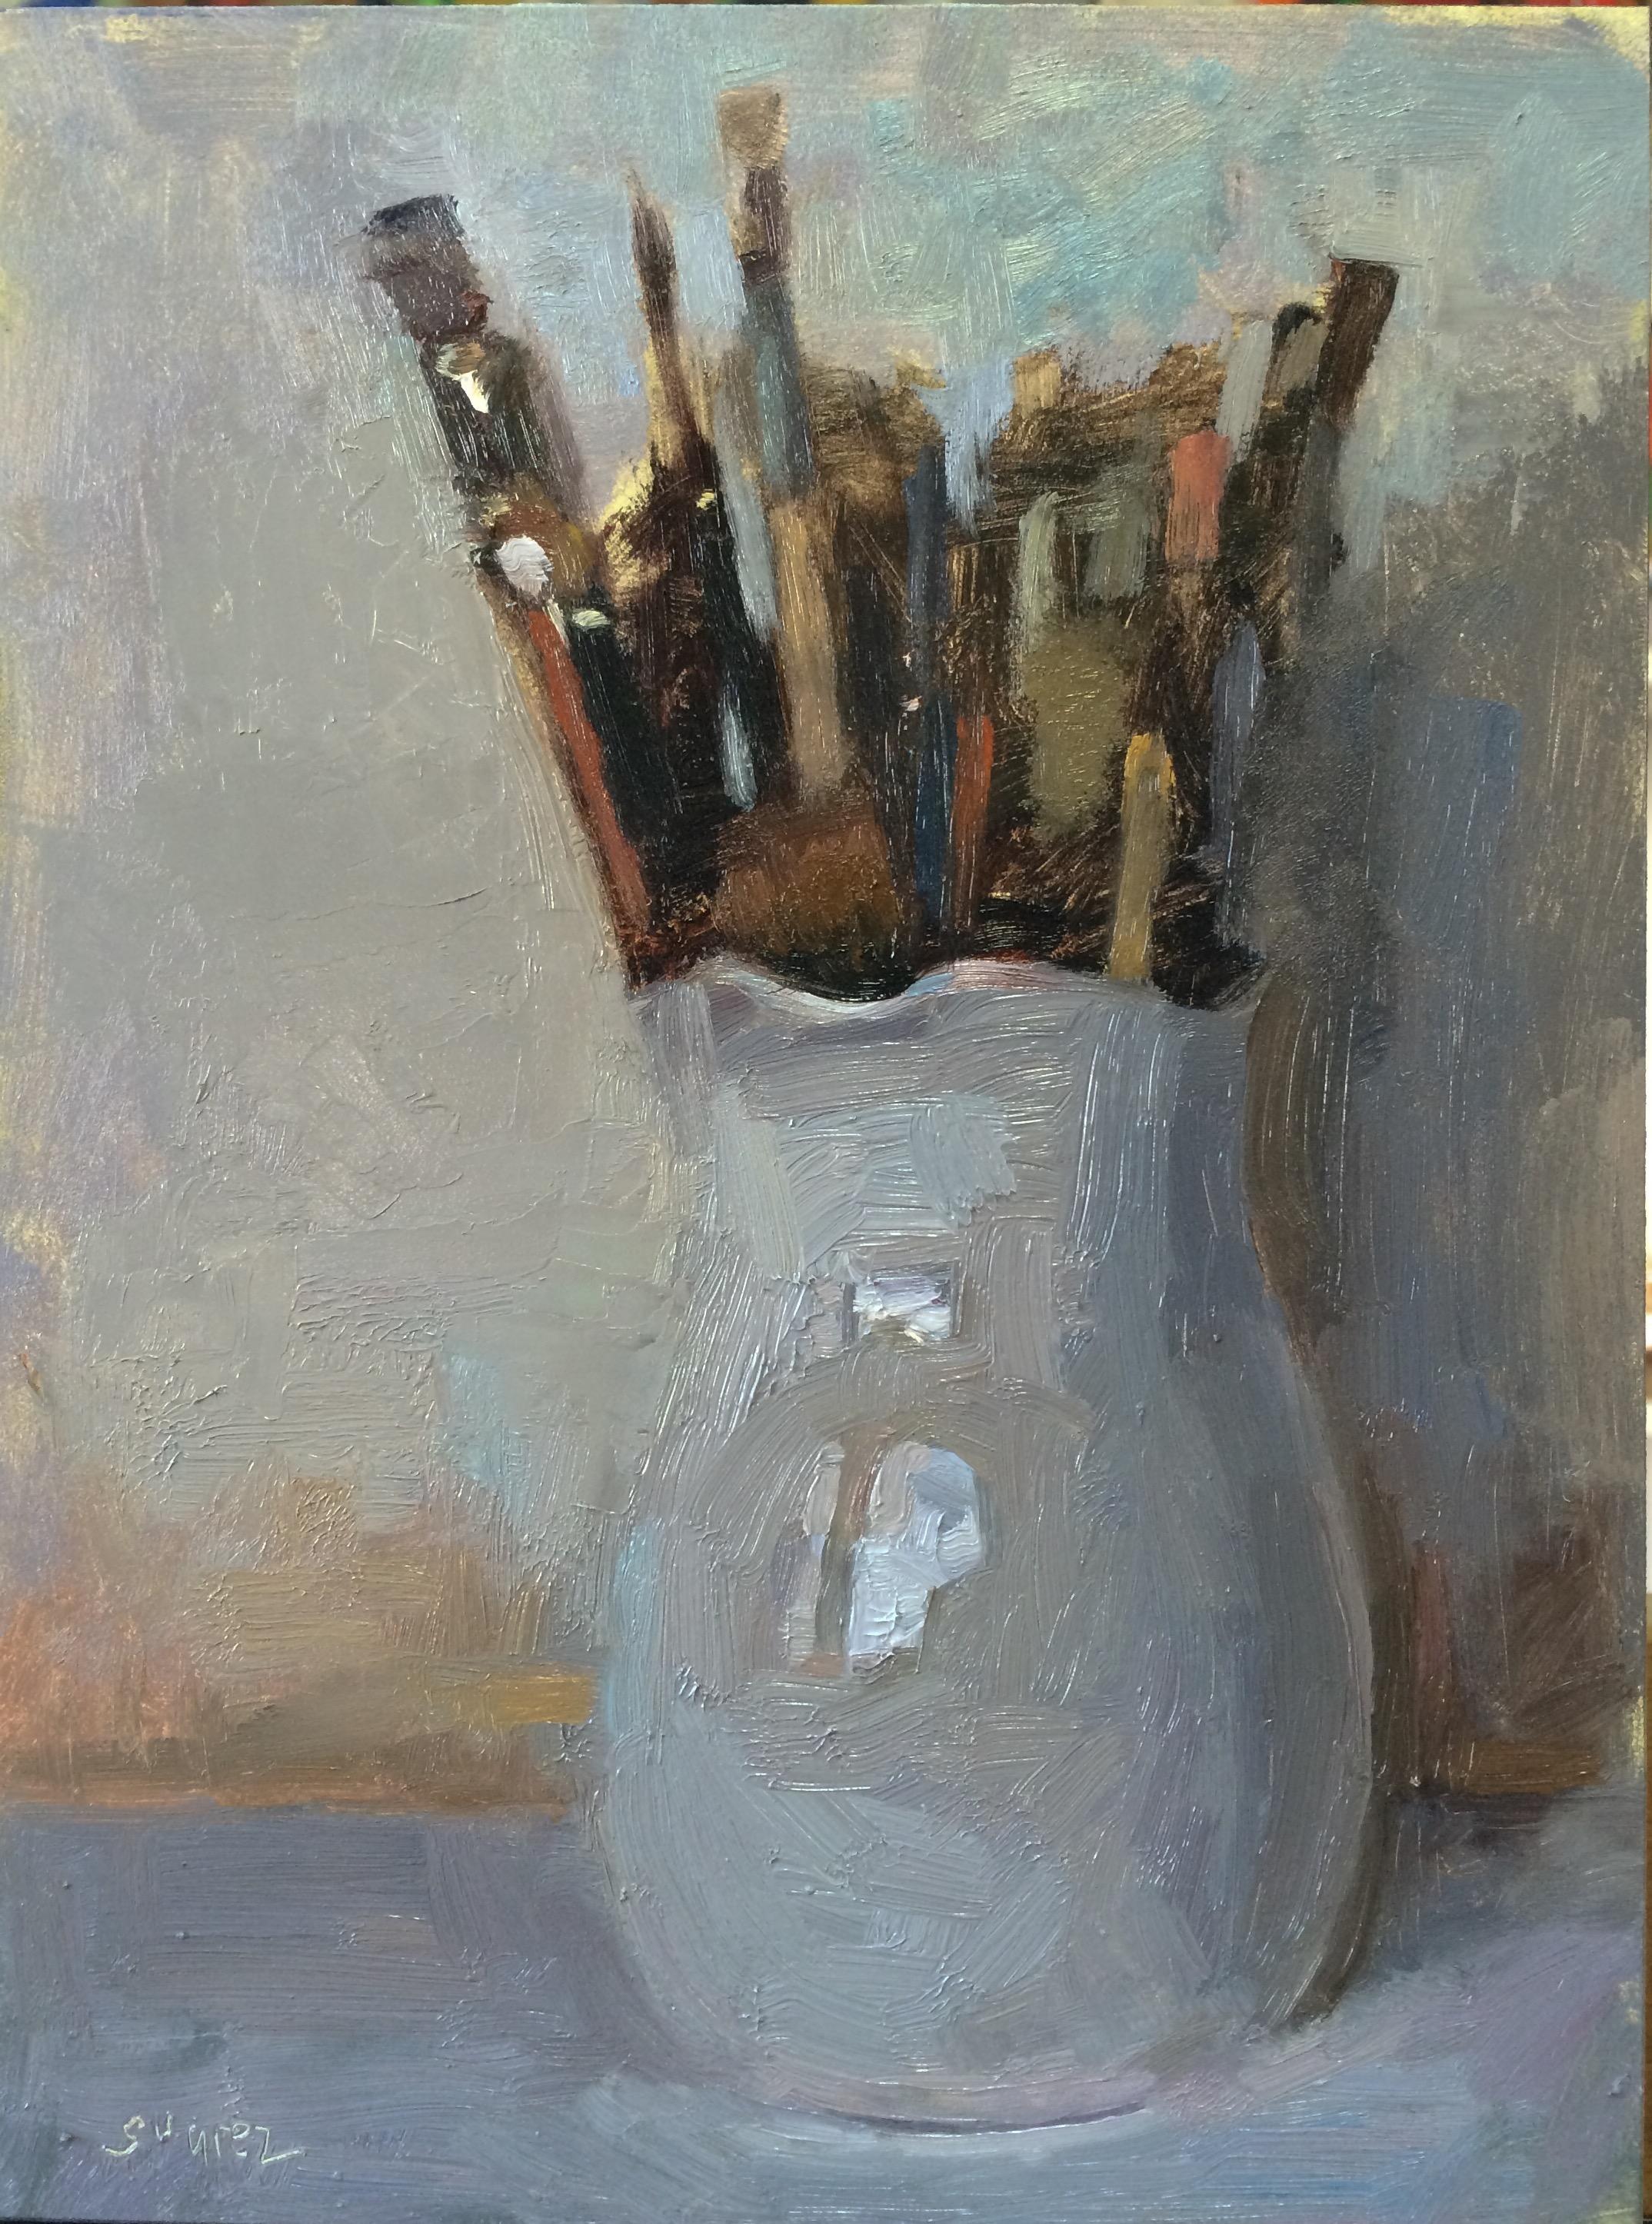 Judy's Brushes